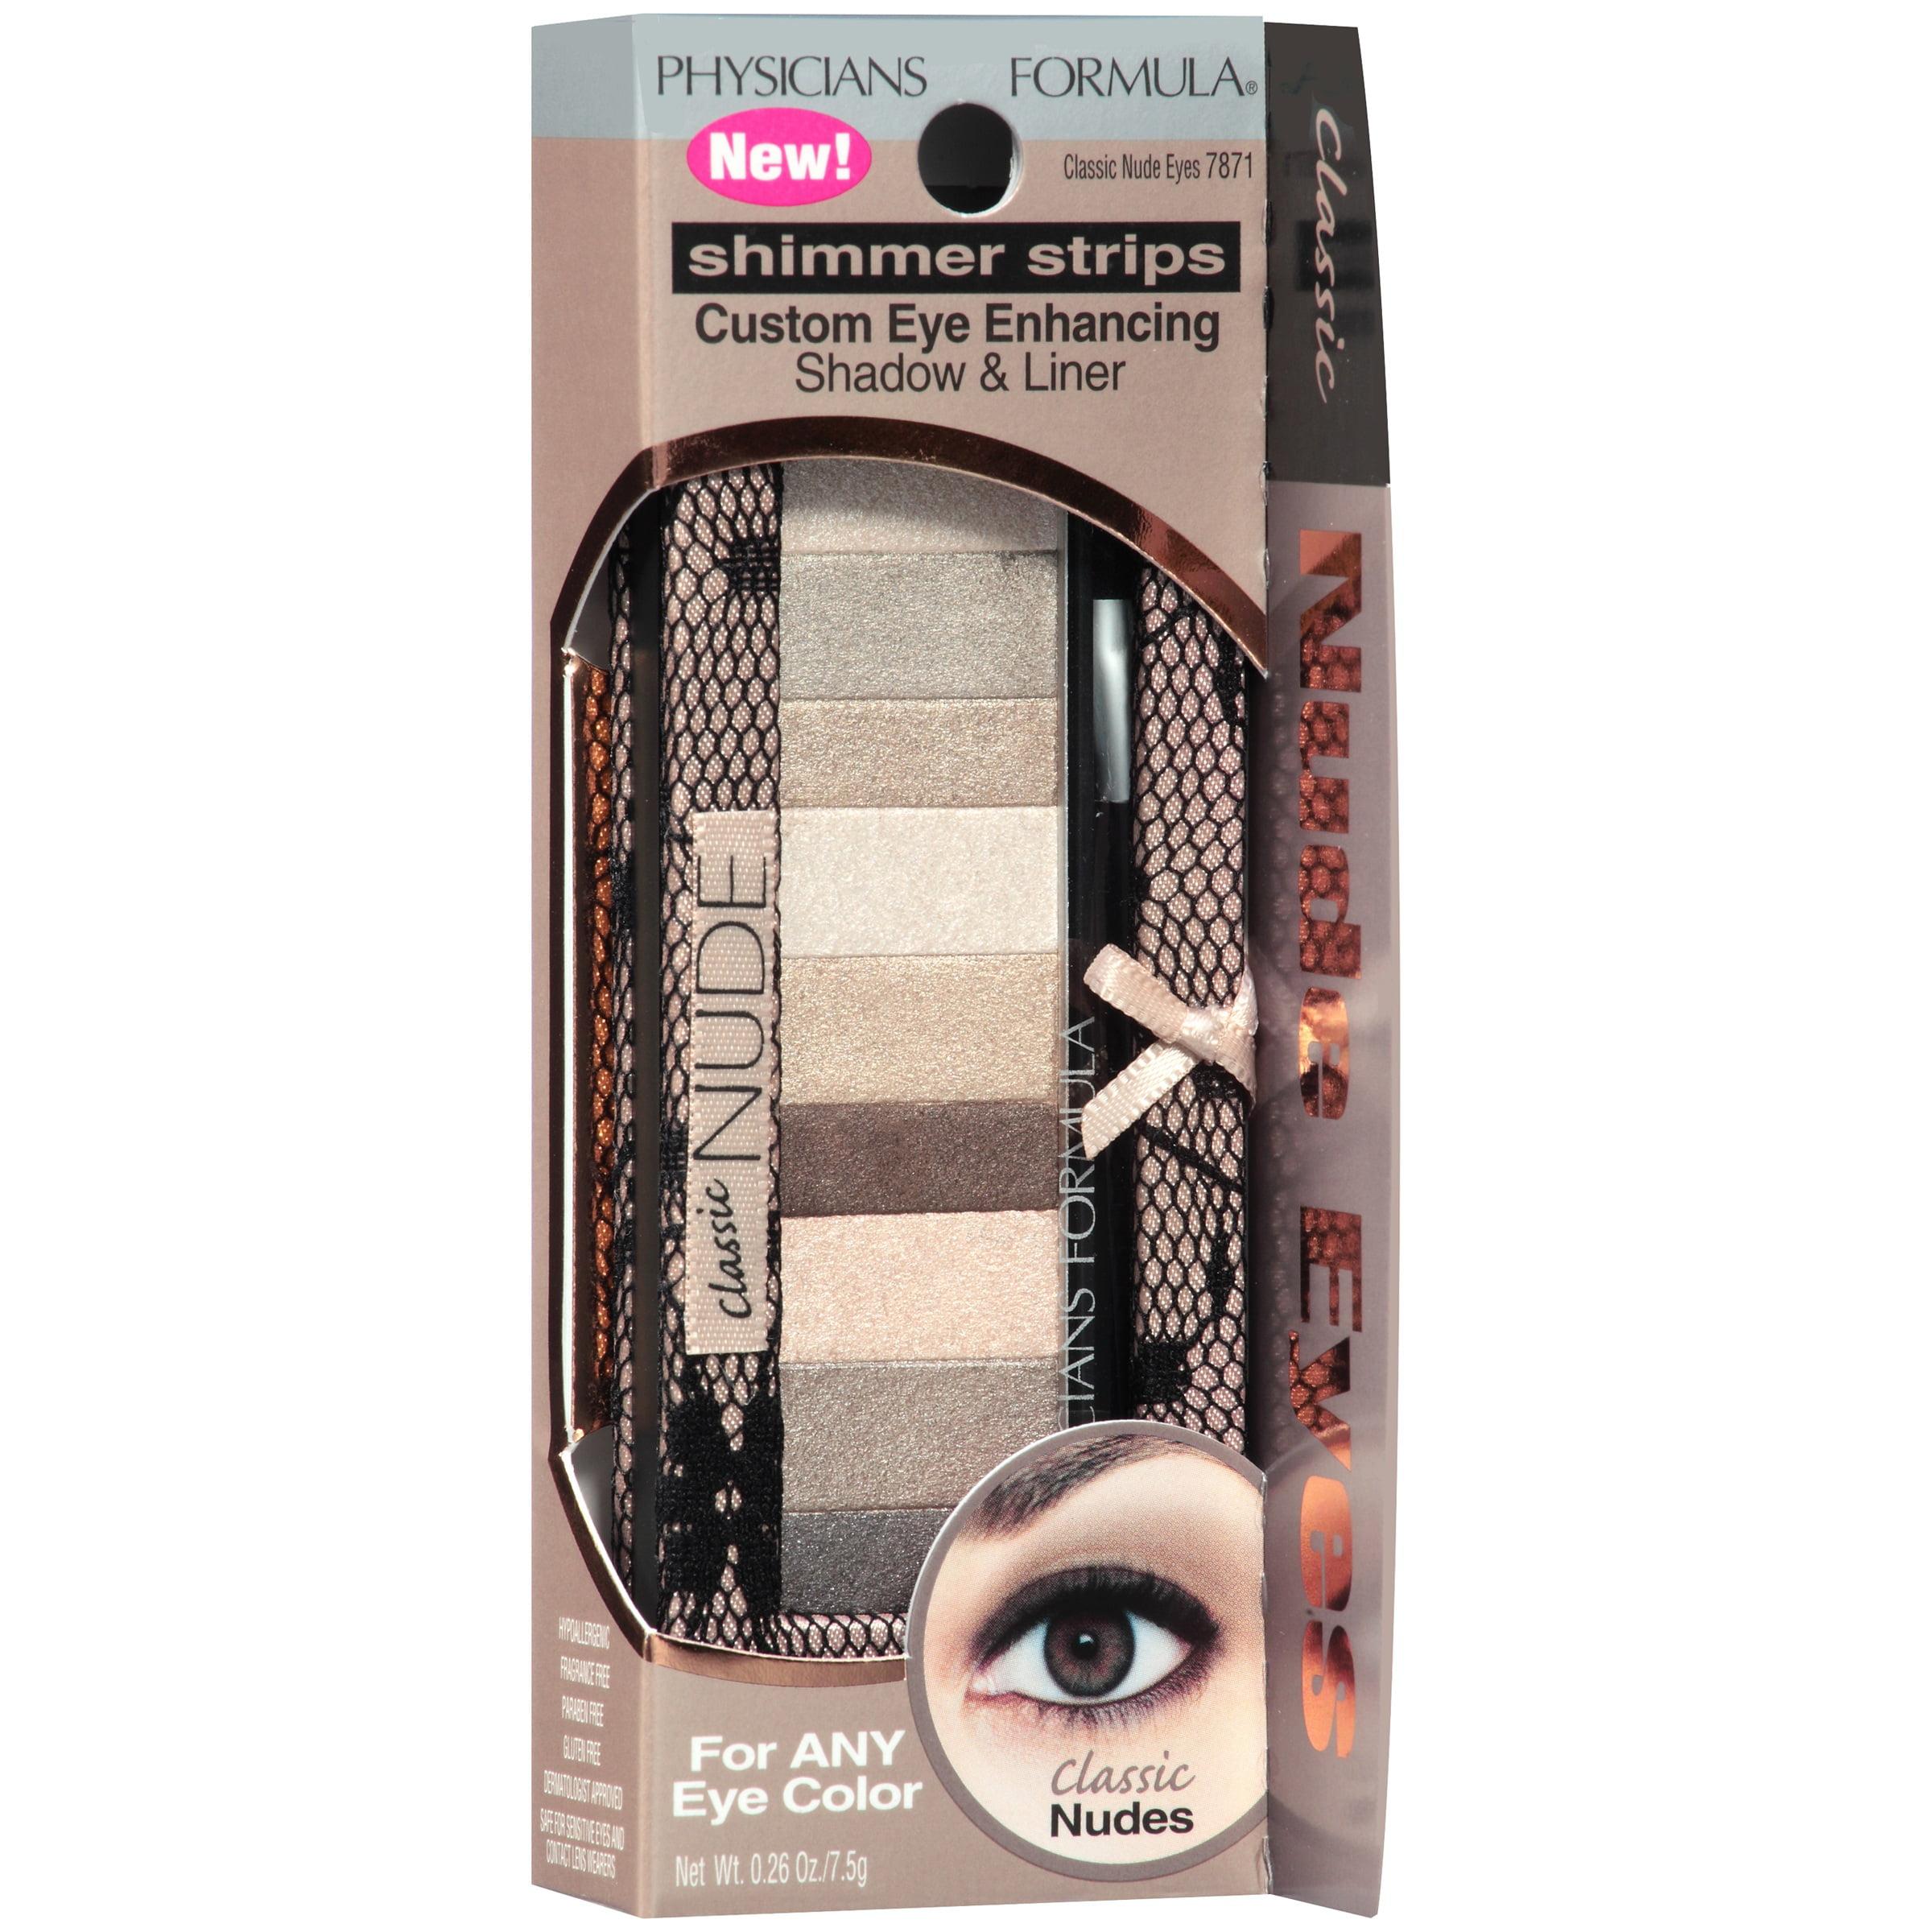 Physicians Formula Shimmer Strips Custom Eye-Enhancing Shadow & Liner, 7871 Classic Nude Eyes, 0.26 oz